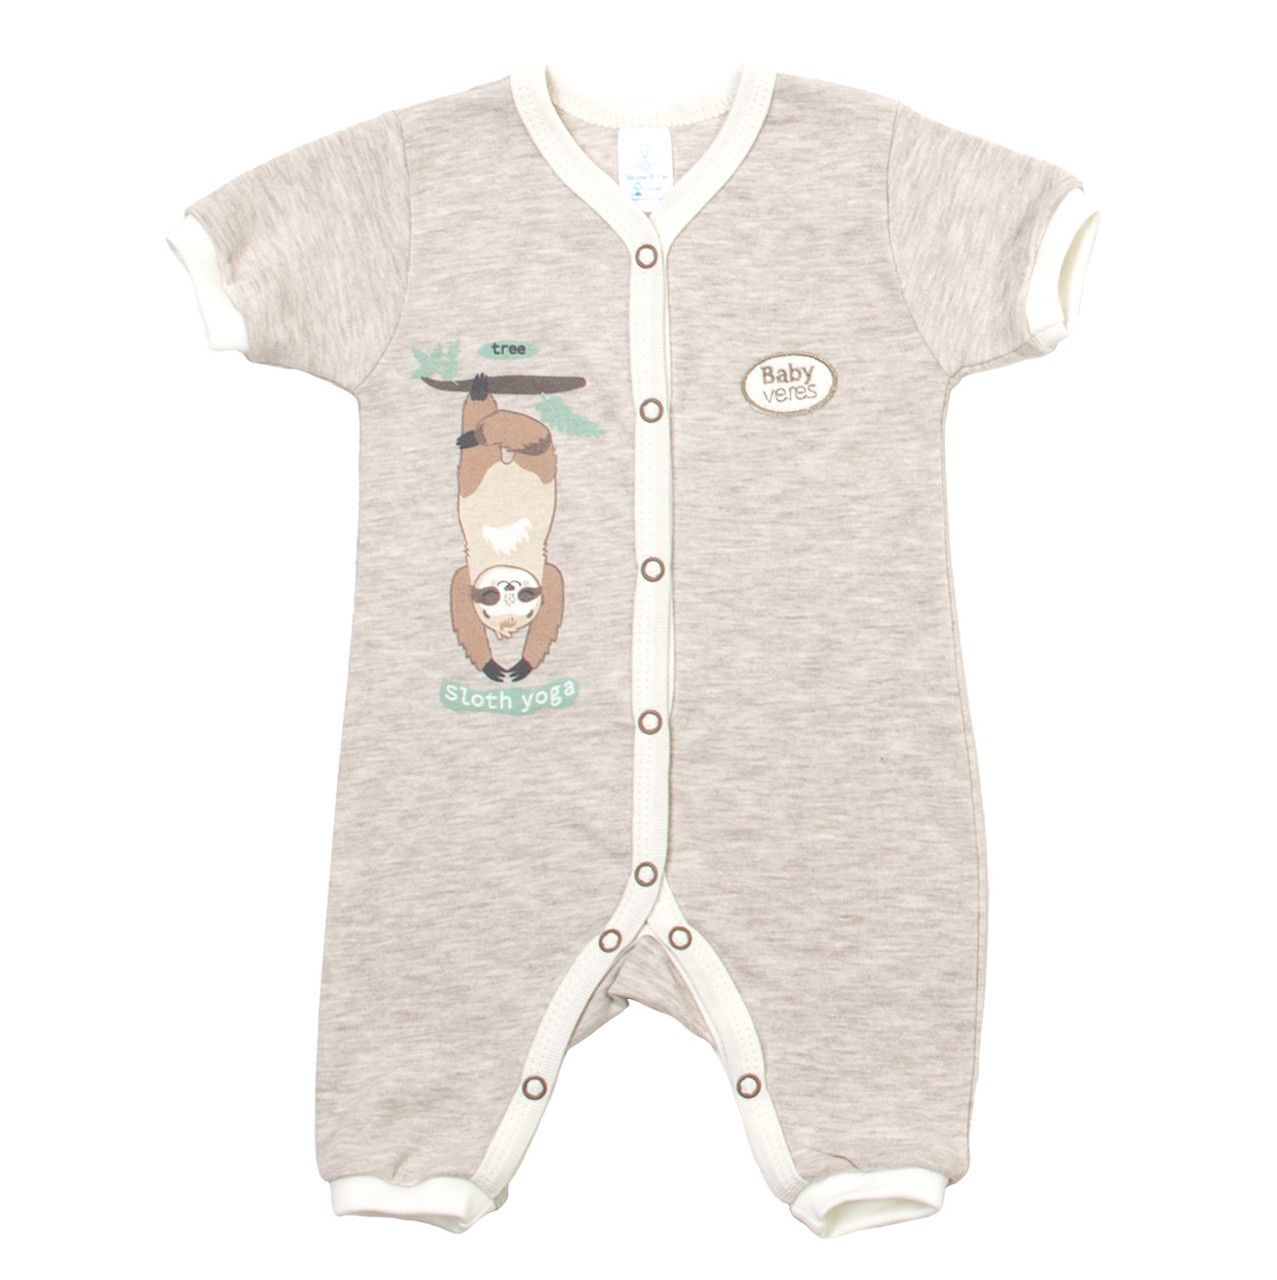 Комбинезон-ромпер Baby Veres Sloth yoga молочный рибана